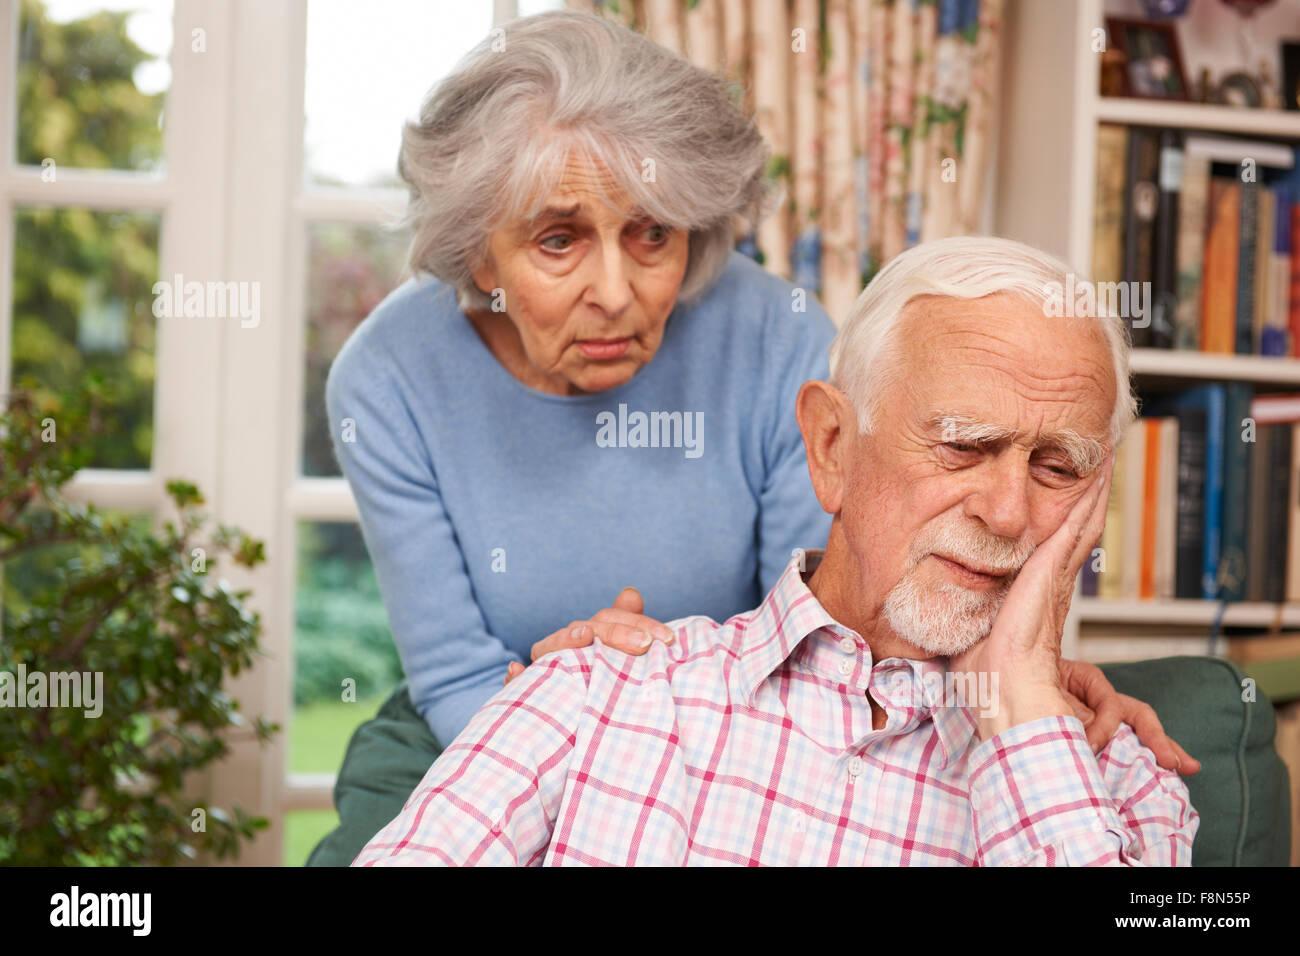 Woman Comforting Senior Man With Depression - Stock Image